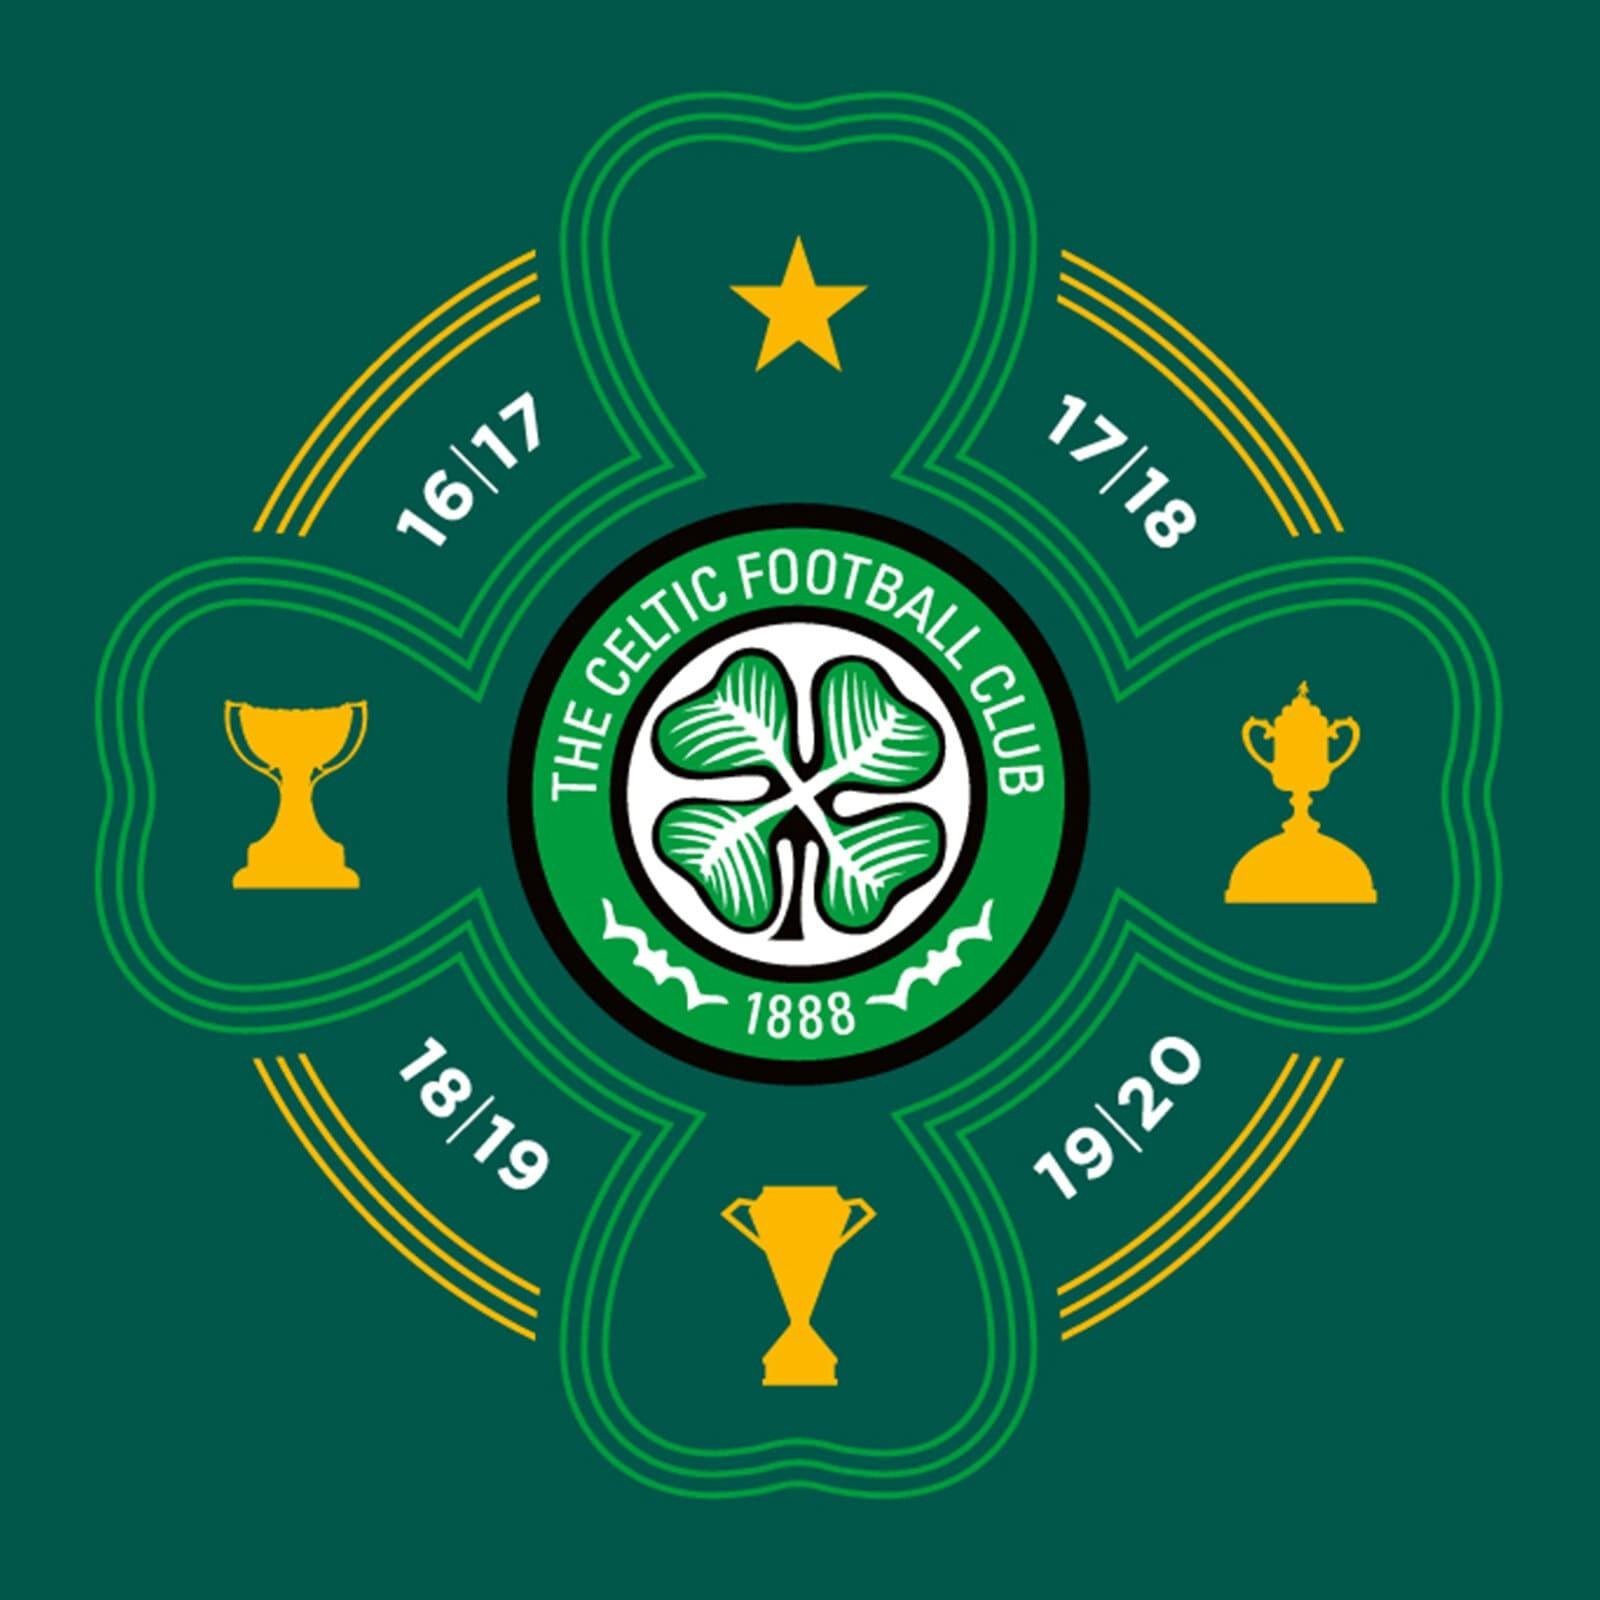 Celtic F.C. httpslh6googleusercontentcomZpQ0lgpAJREAAA